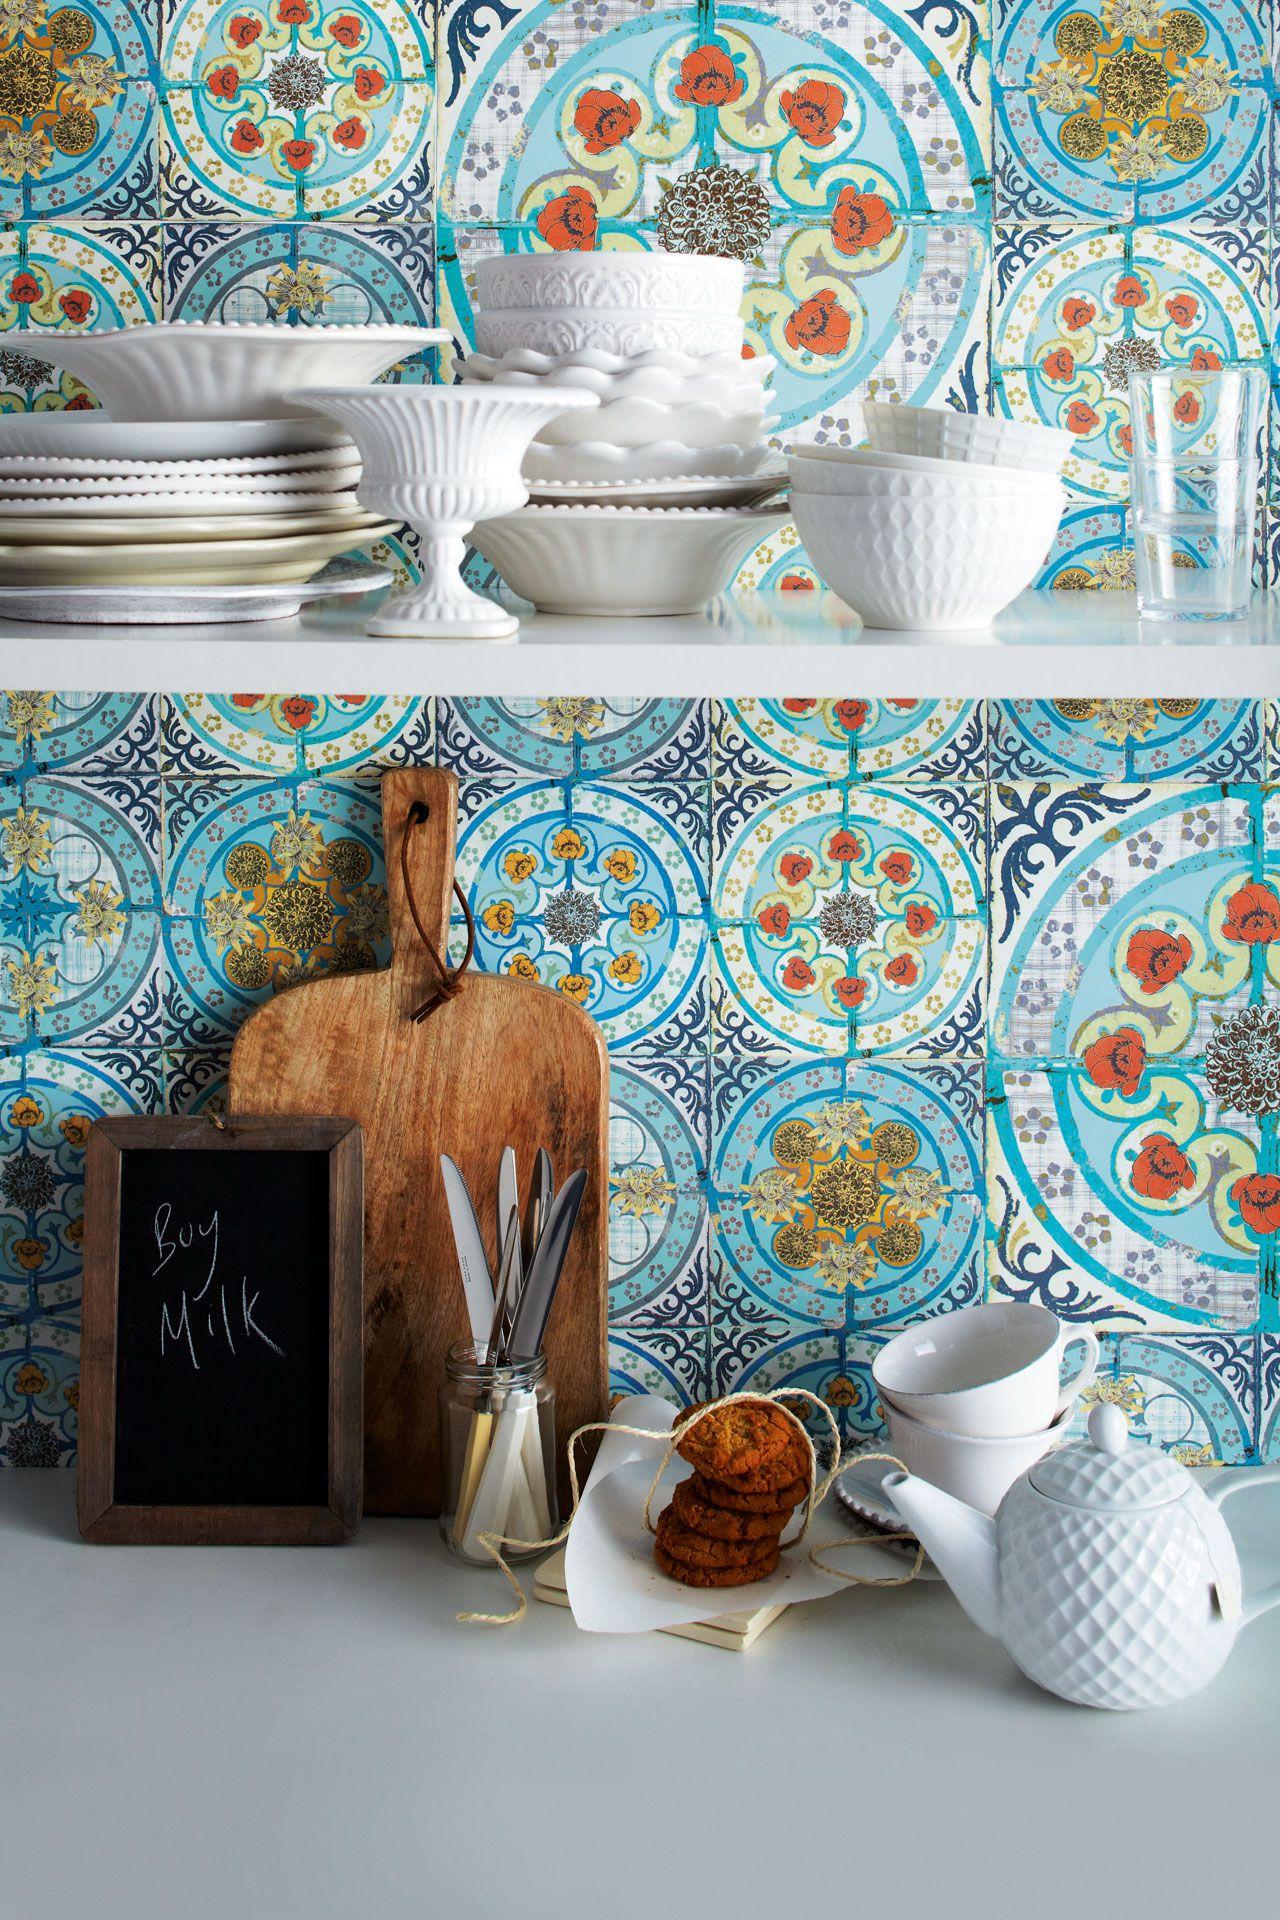 Beautiful Backdrops | dream home | Pinterest | Kitchens, Wallpaper ...